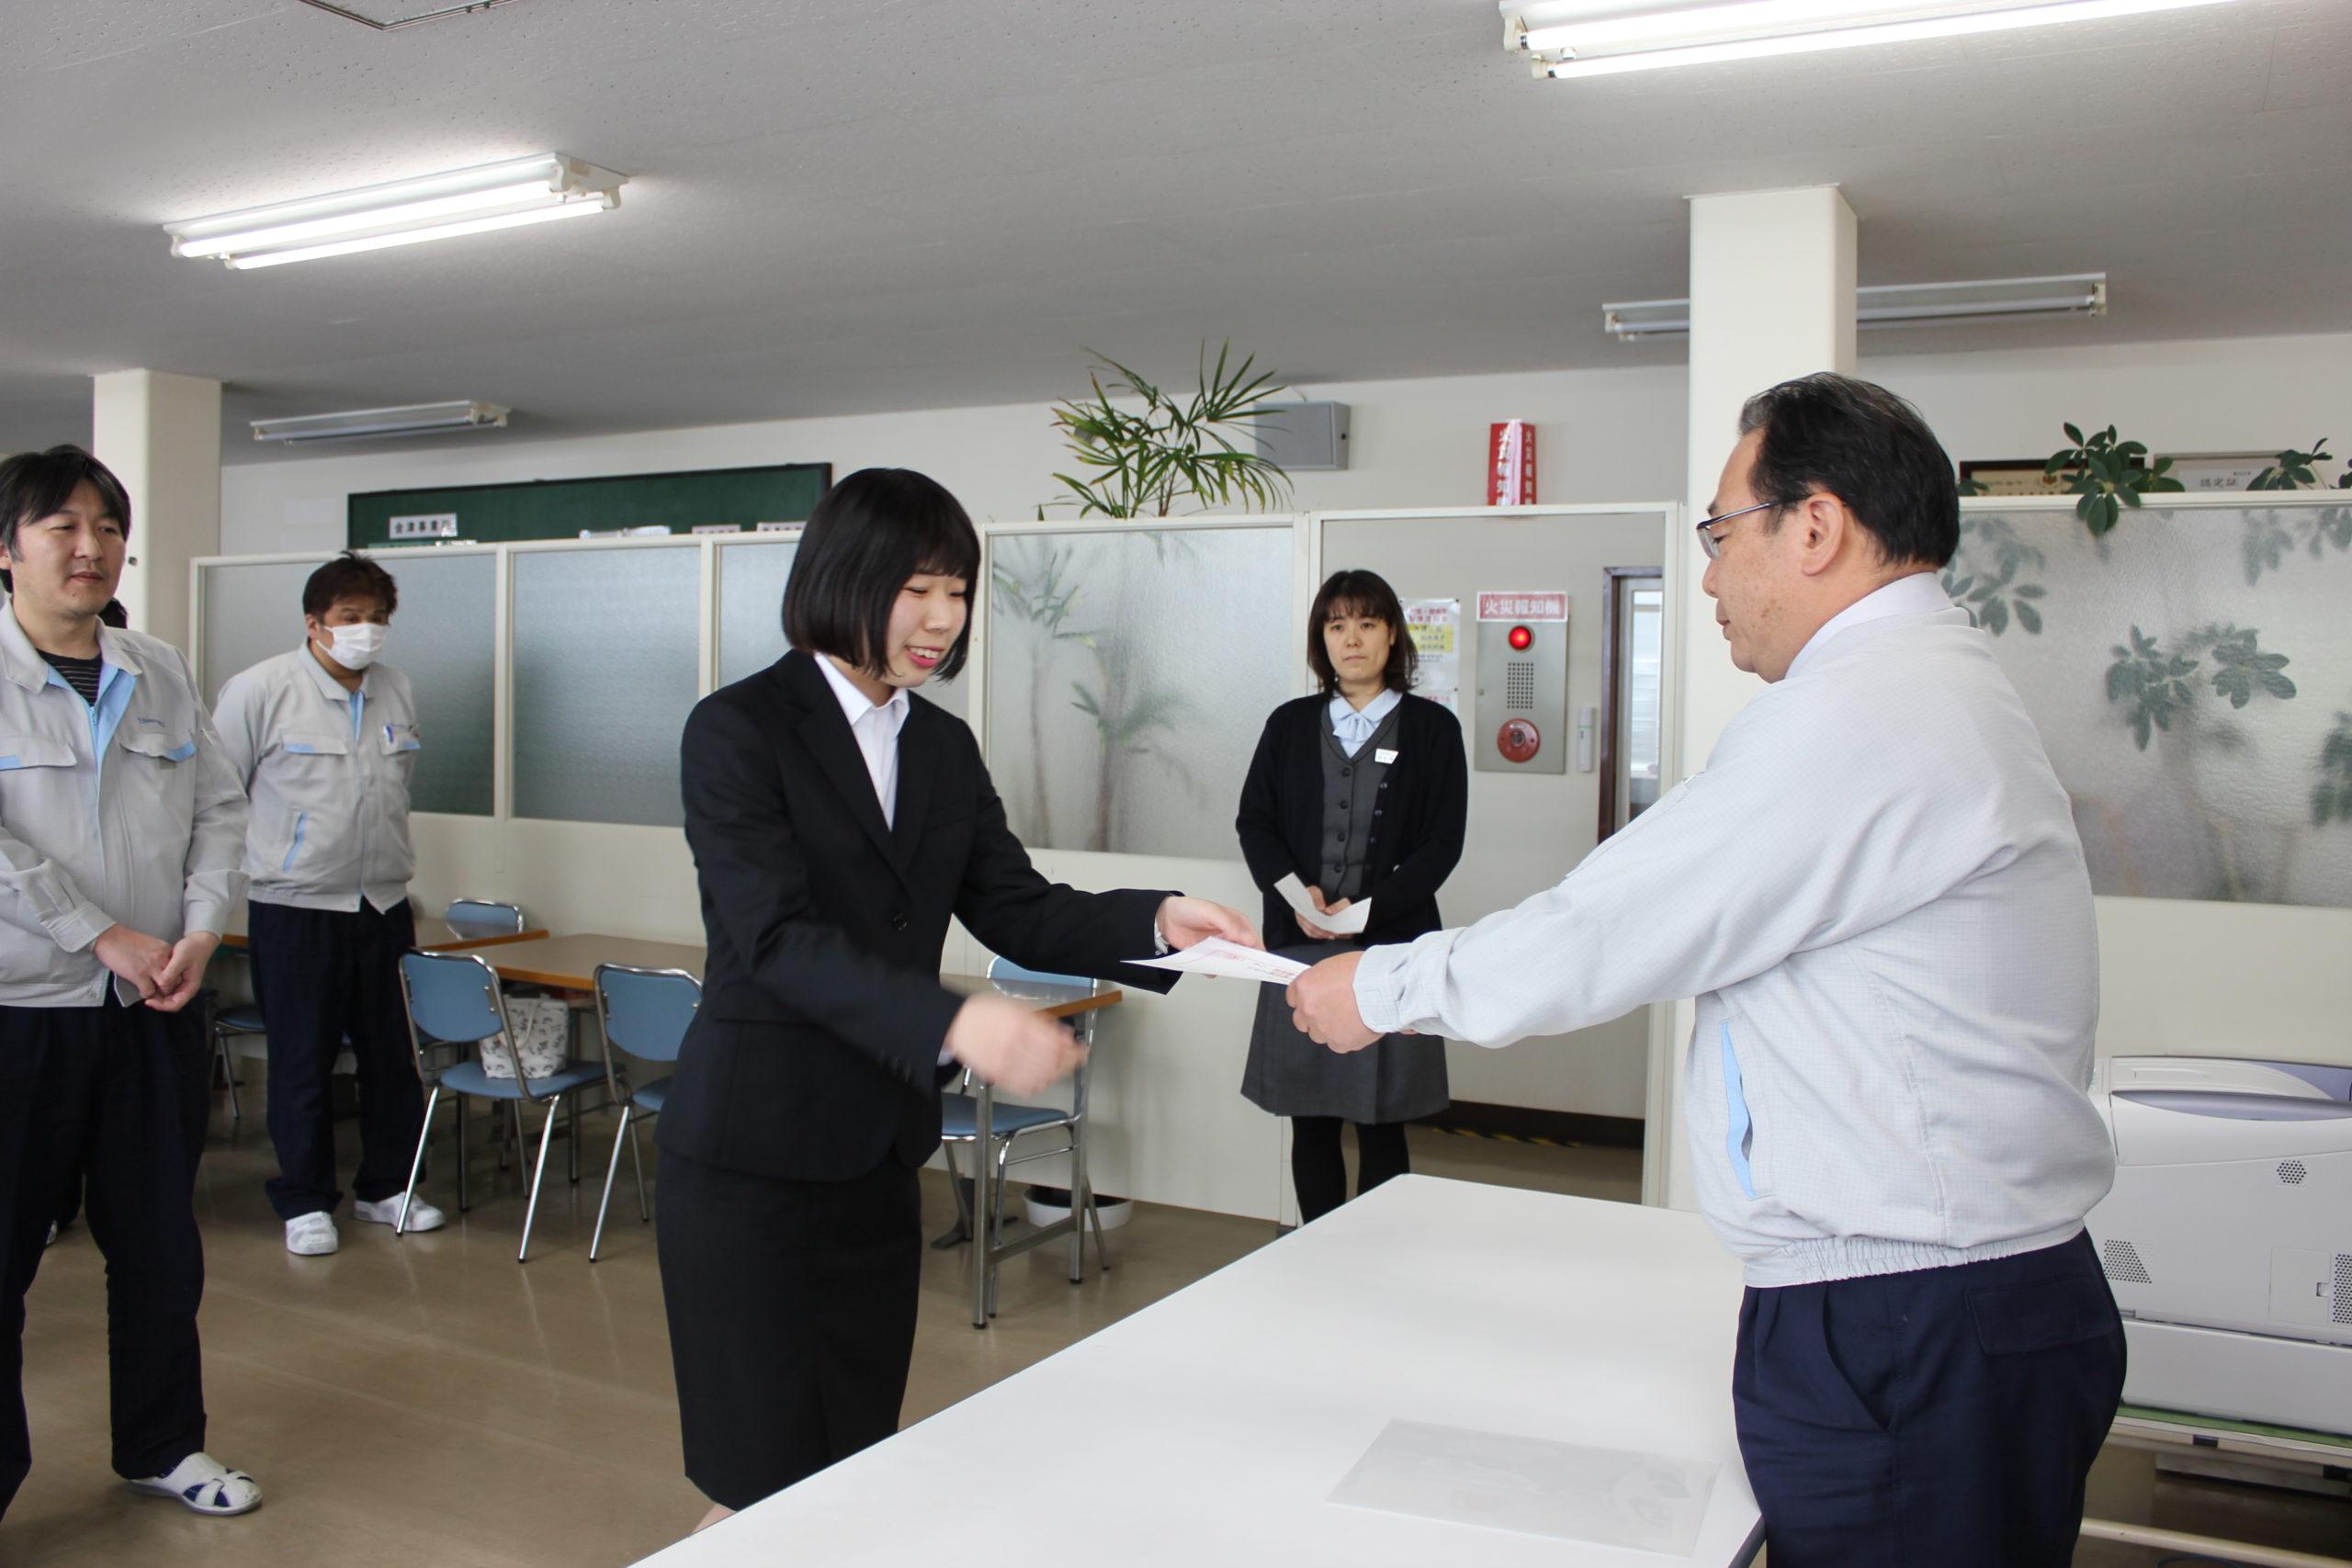 ヤマキ電気福島株式会社 会津事業所 入社式